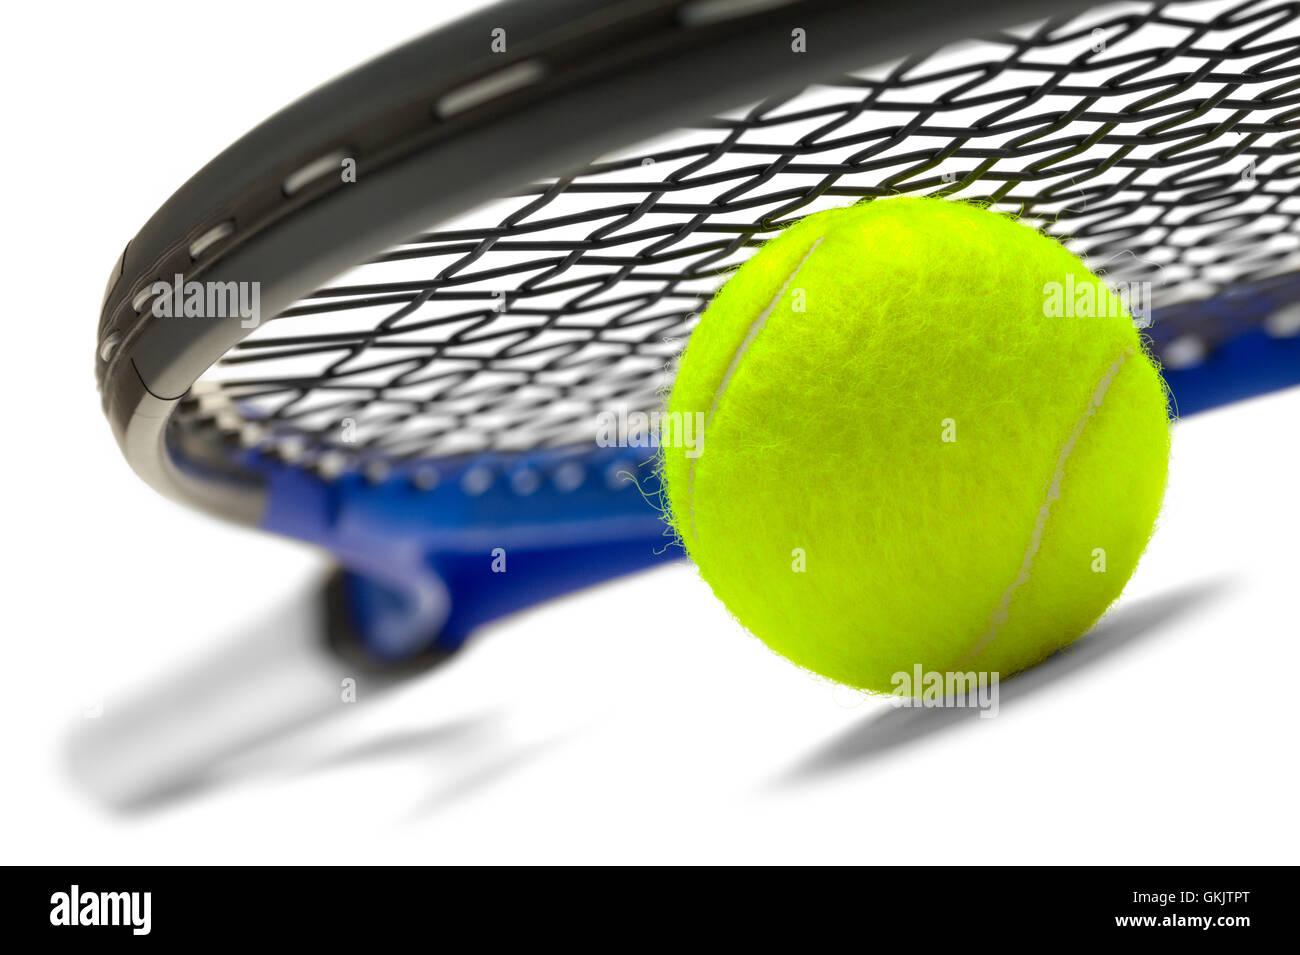 315da3b32183a Raquette de Tennis bleu et noir avec ballon vert isolé sur fond blanc.